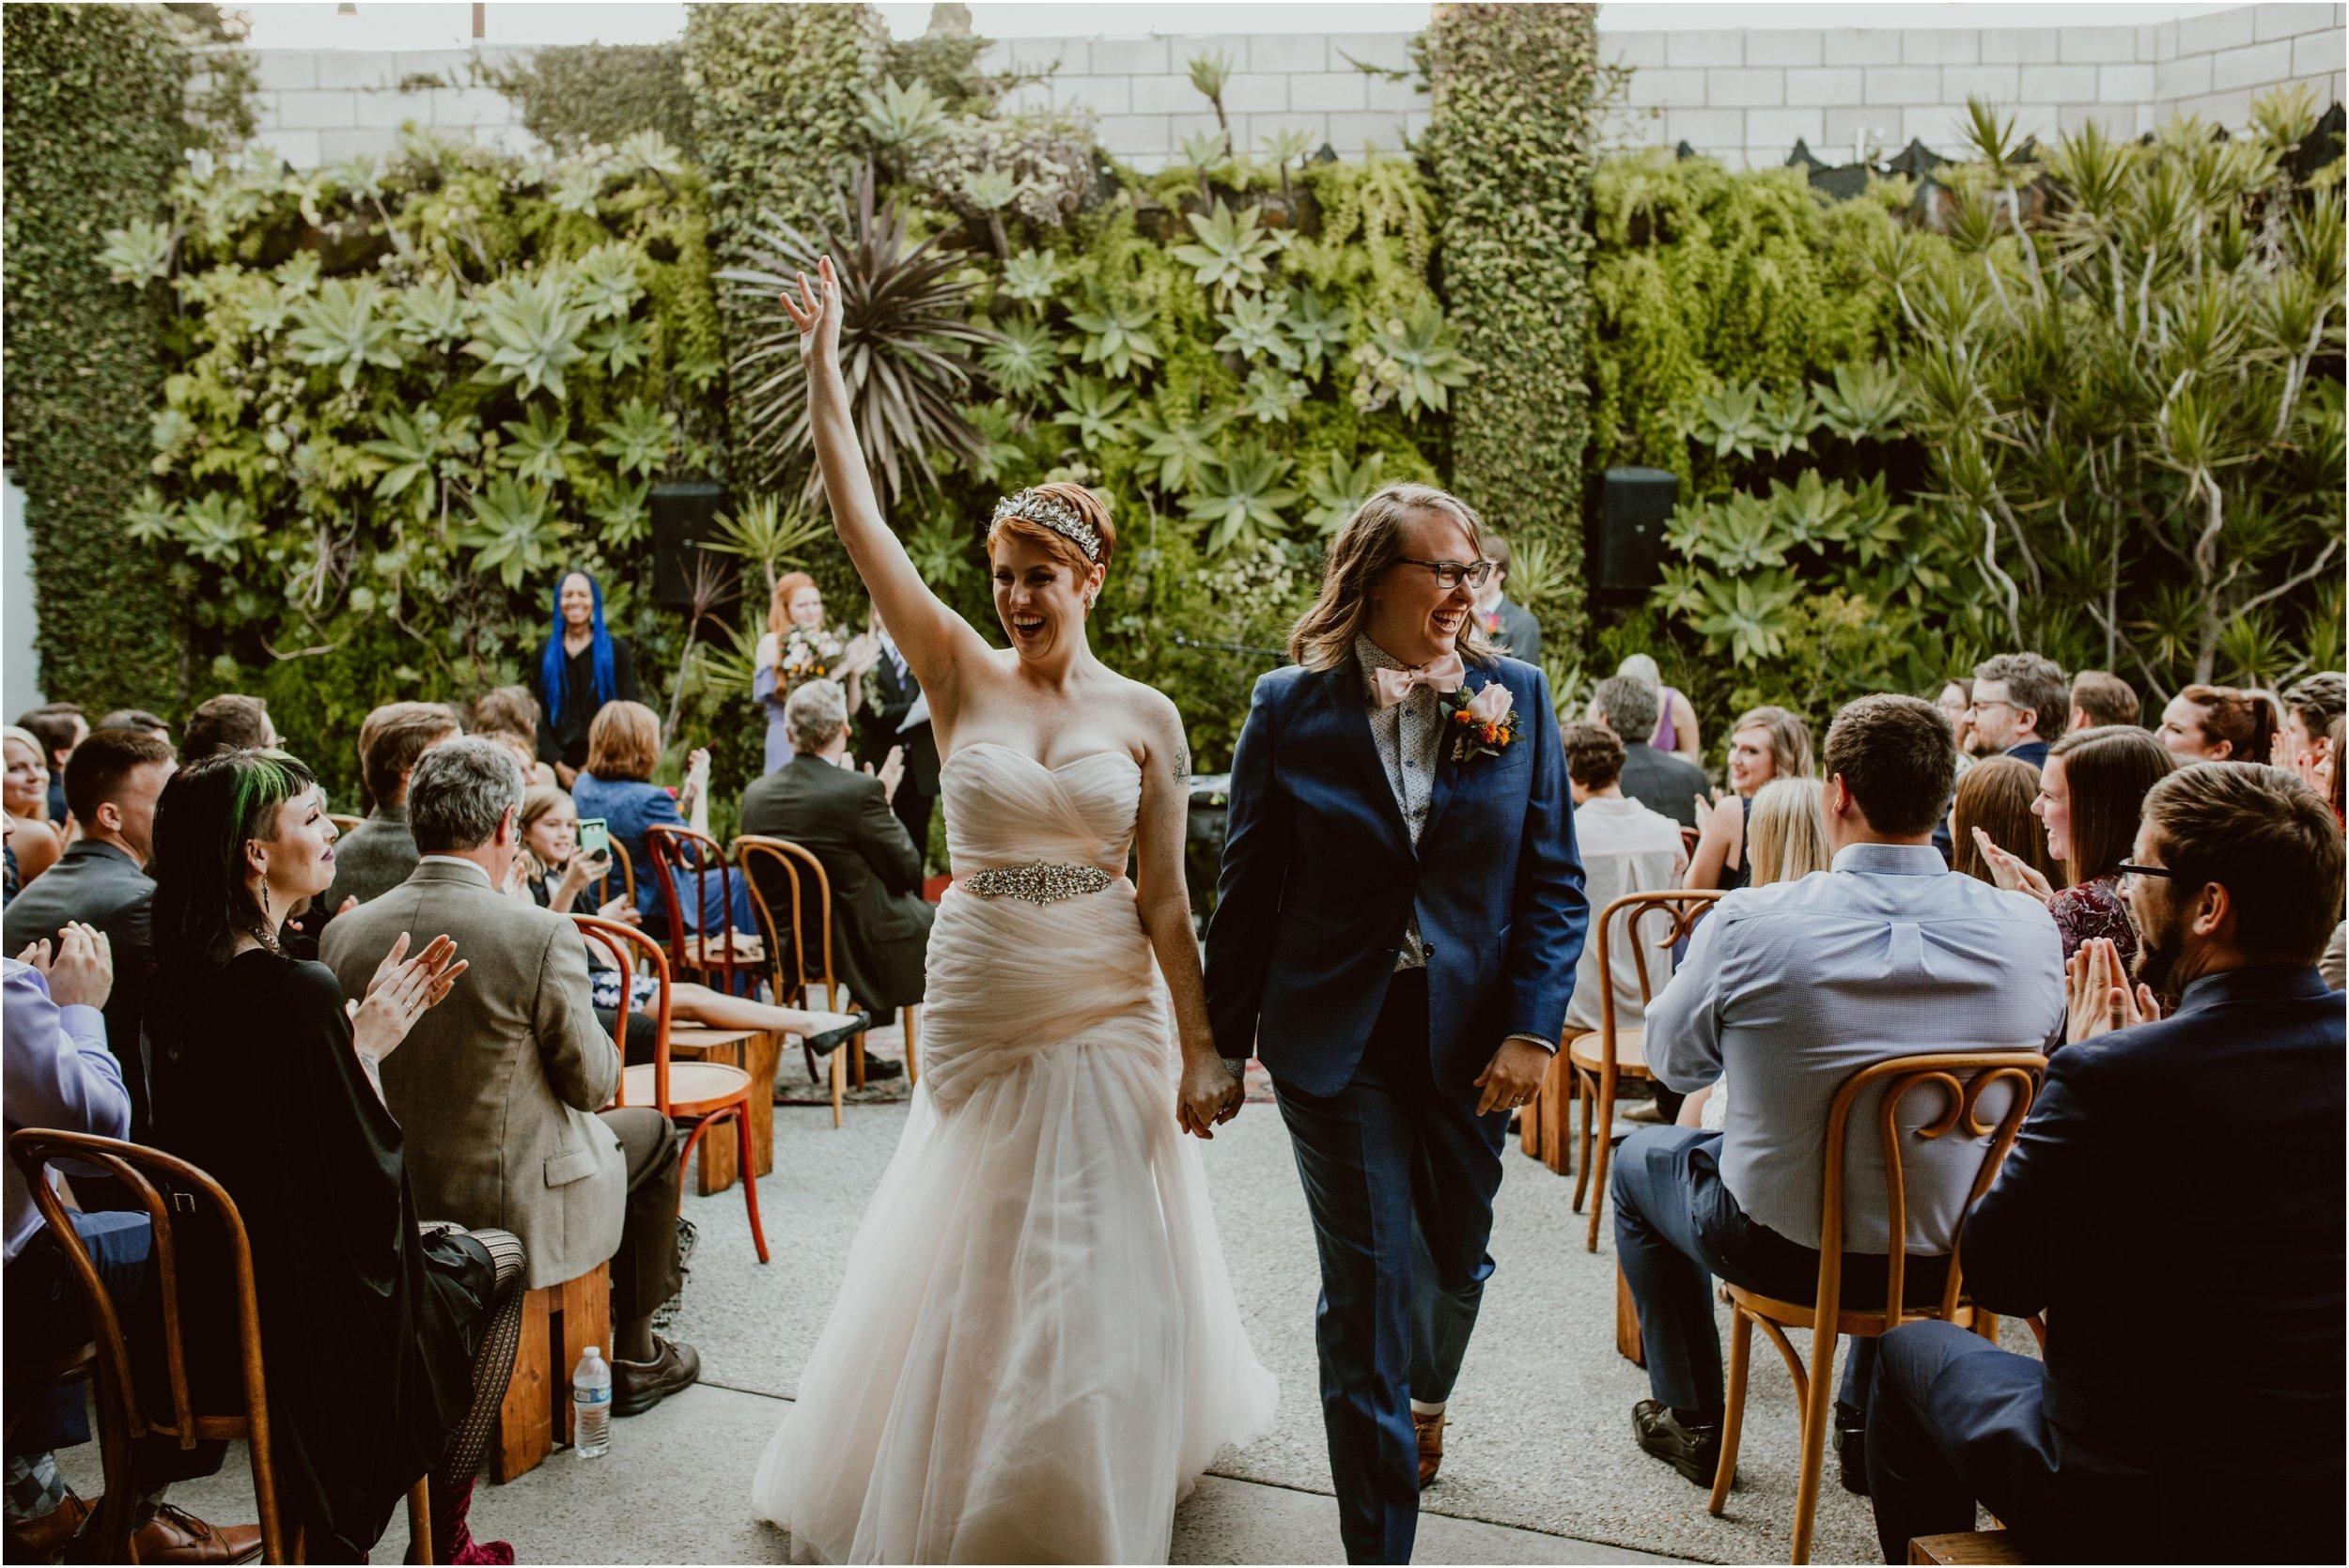 Smogshoppe-Wedding-S+C-Diana-Lake-Photography-571.jpg